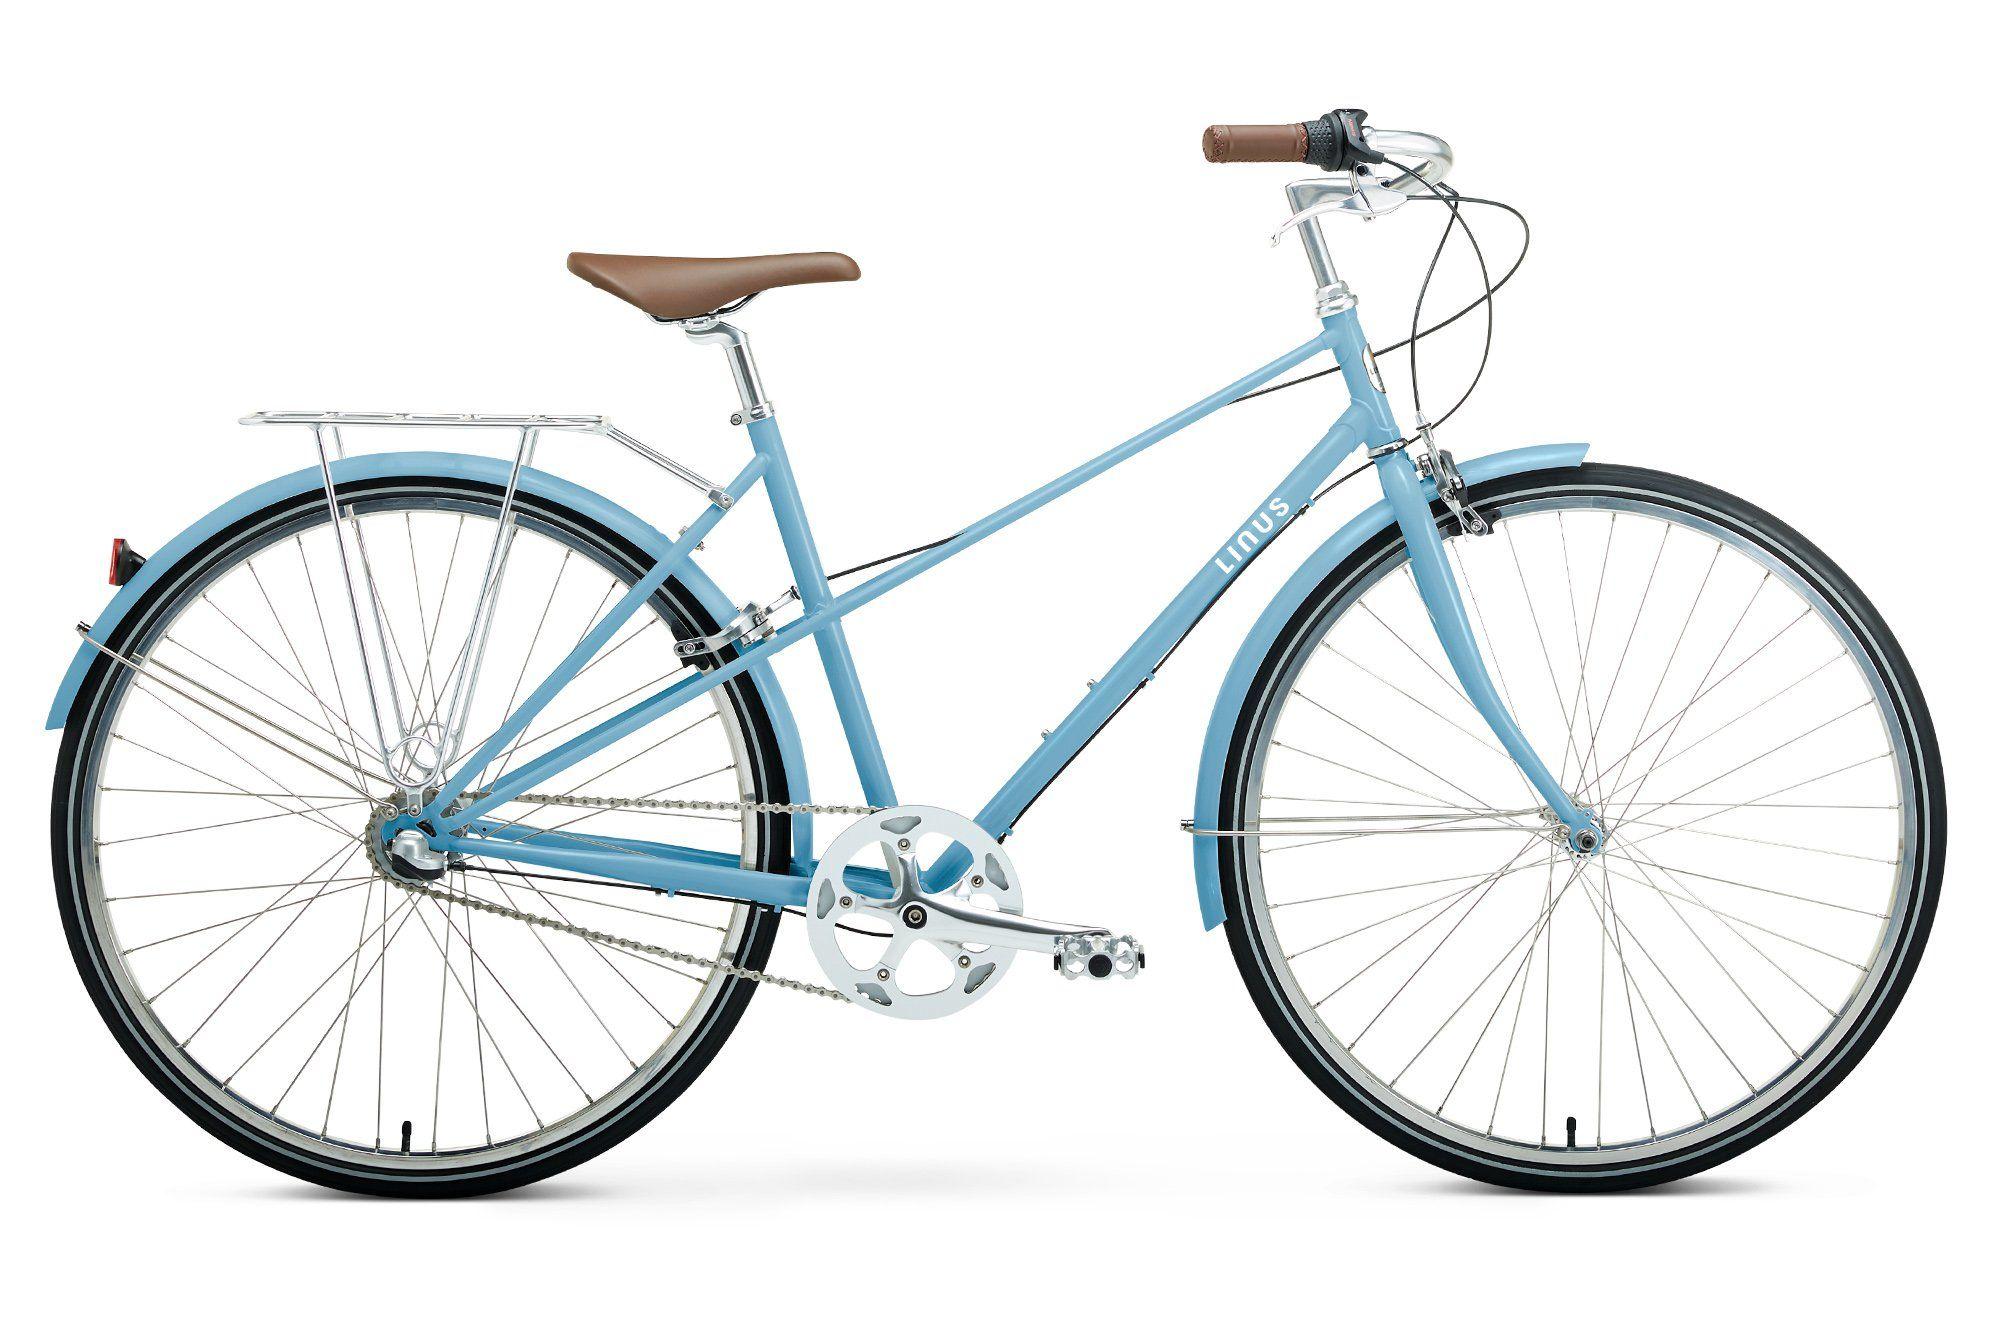 Mixte 3i City Bike Retro Bike Bike